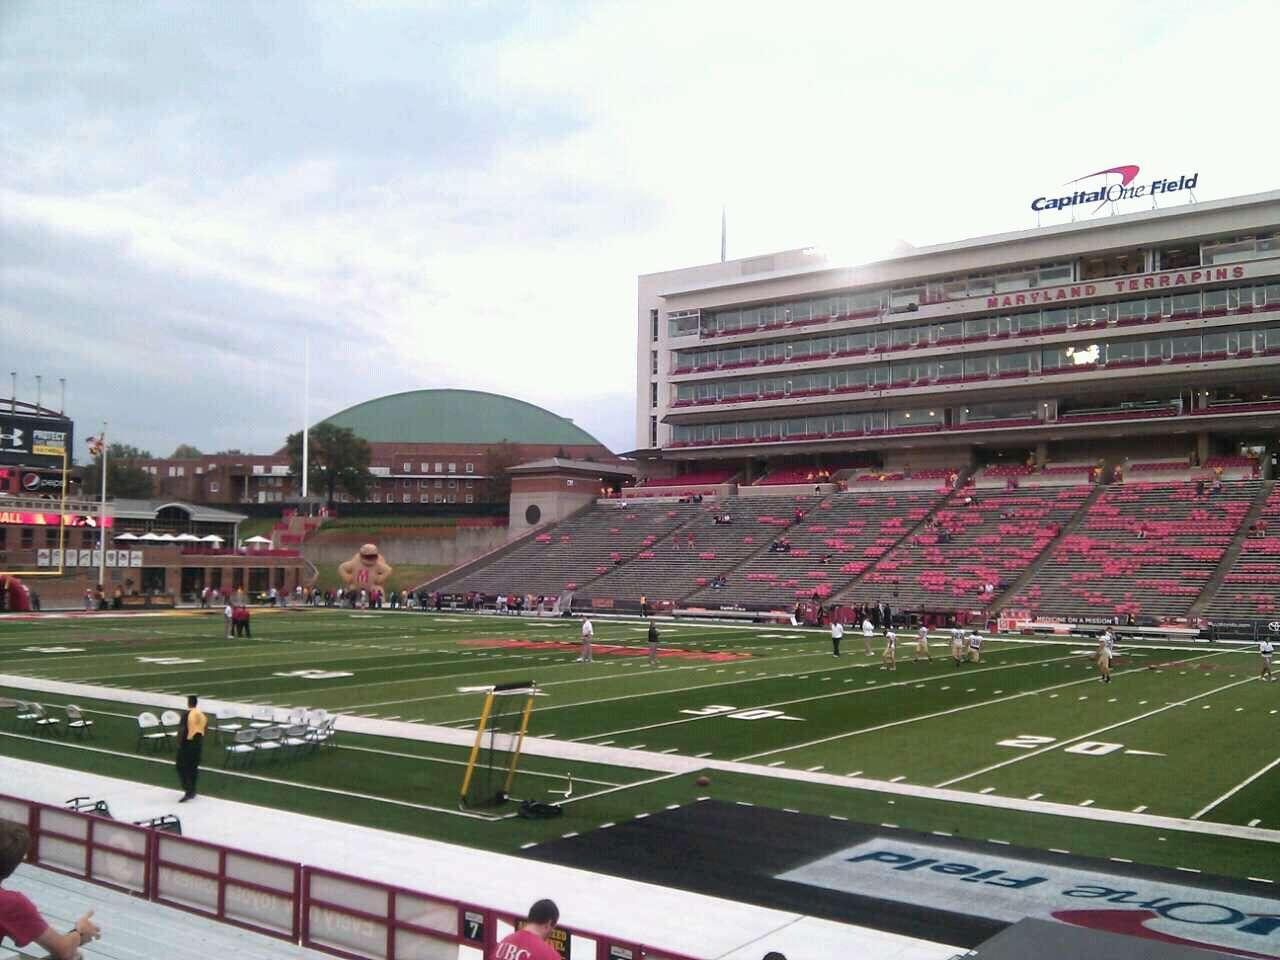 Maryland Stadium Section 8 Row m Seat 14